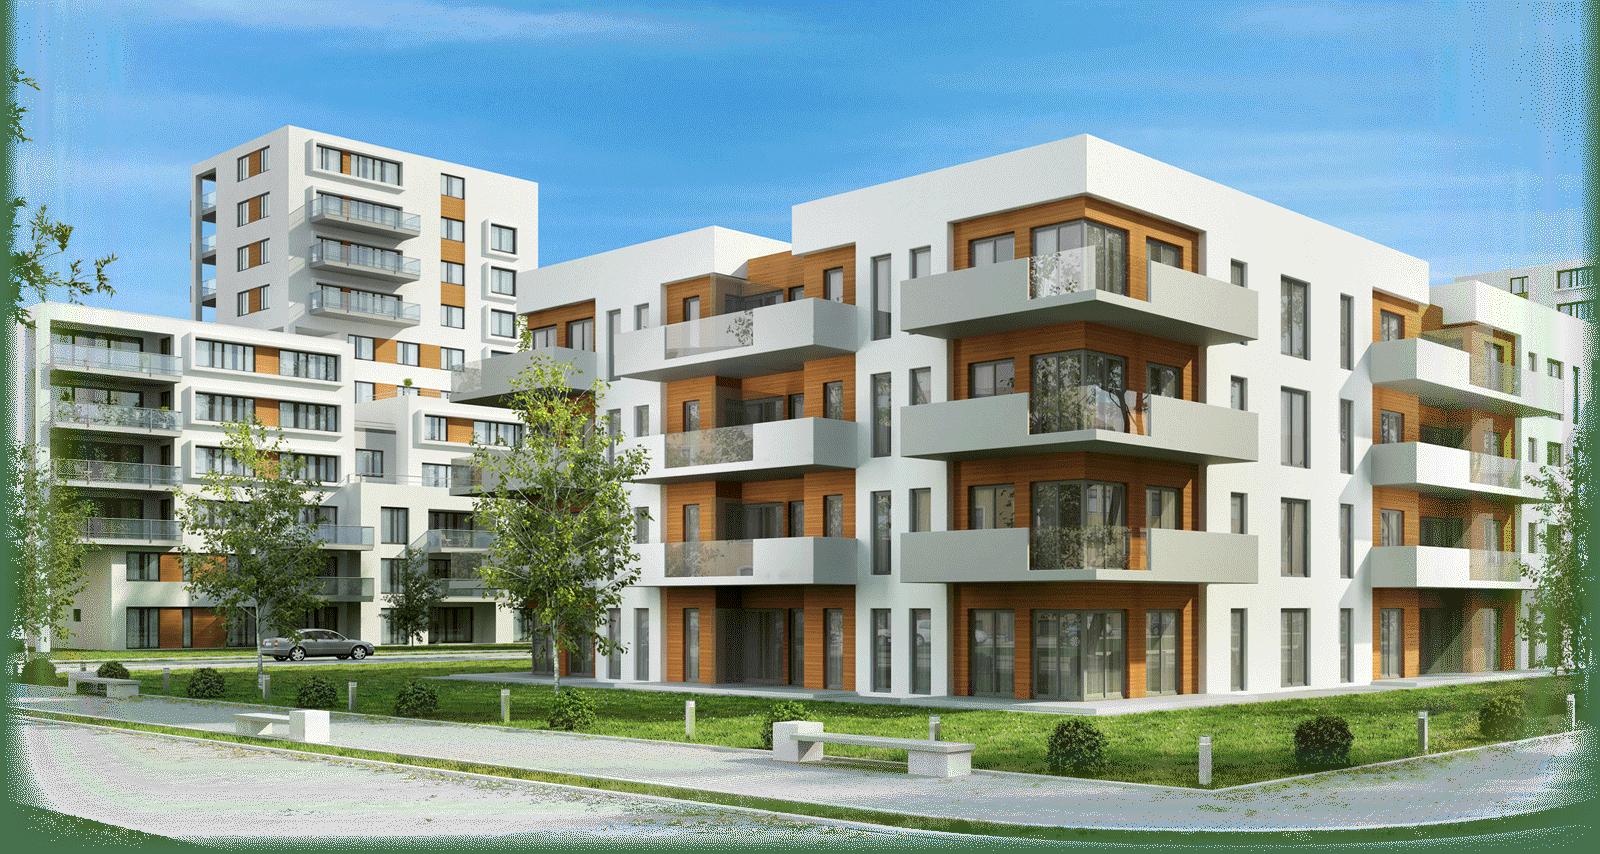 Urban design, Tower block, Building, Sky, Plant, Window, Cloud, Tree